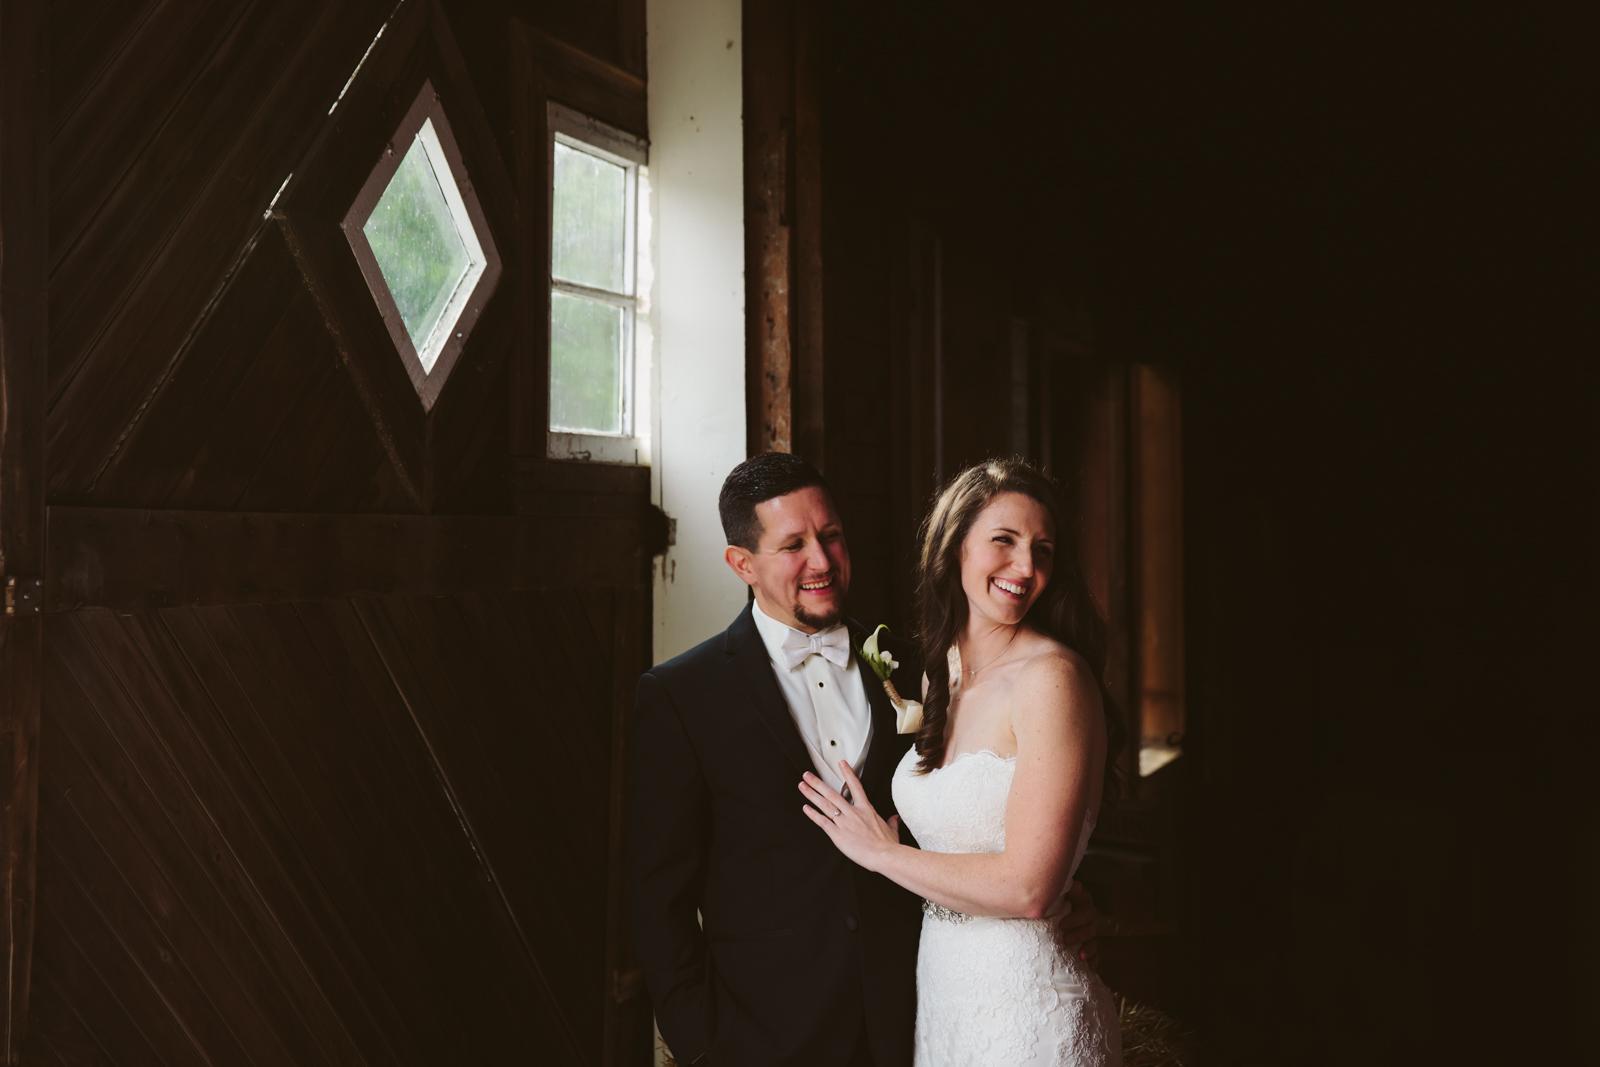 Glimmerstone-Mansion-Vermont-Wedding-Photography-Amanda-Morgan-89.jpg